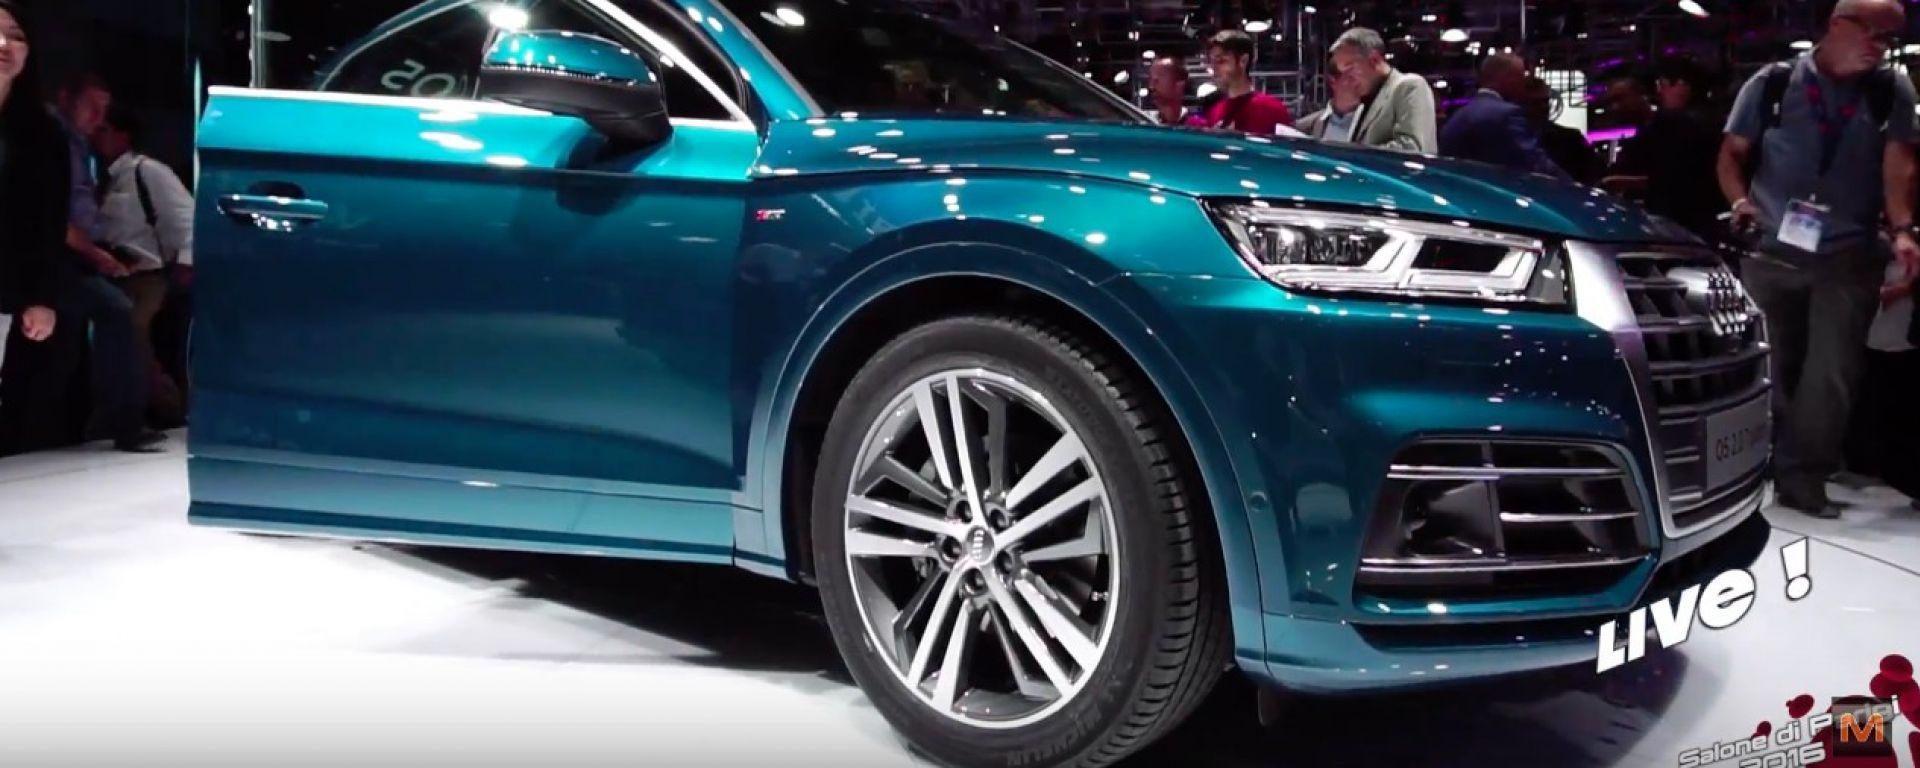 Live Parigi 2016: nuova Audi Q5 e RS3 Sedan in video